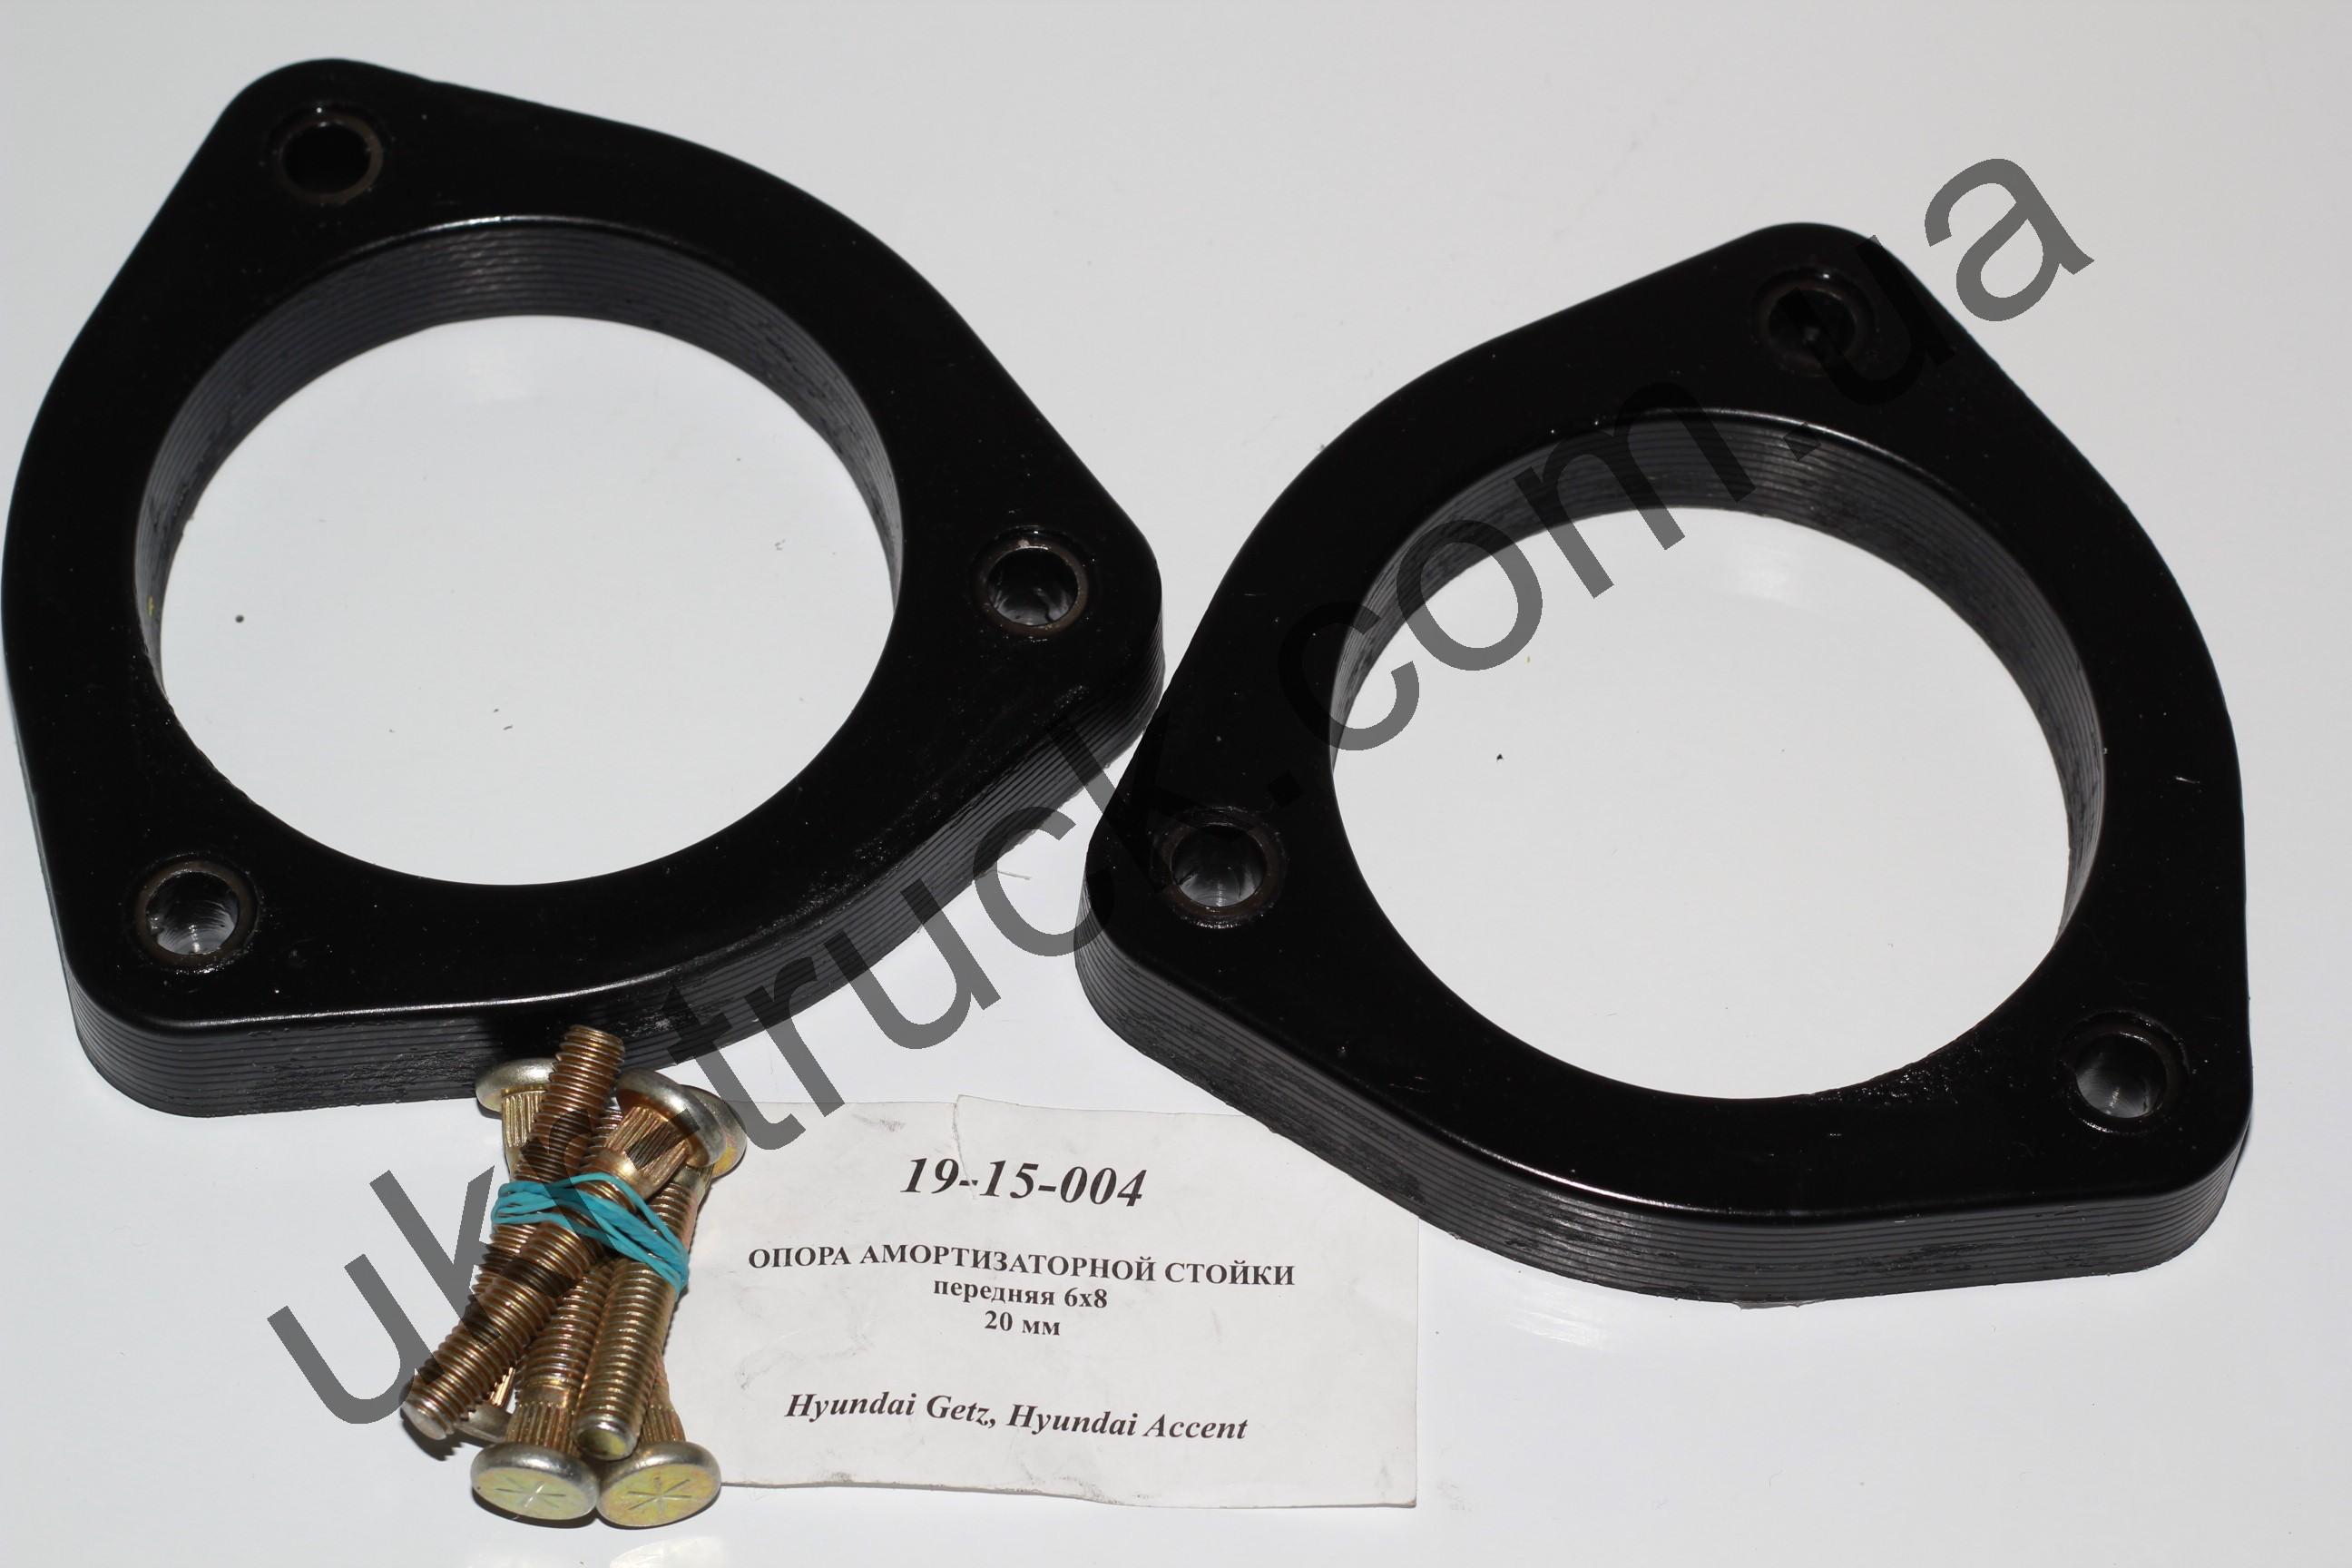 19-15-004 проставка передняя 20 мм Hyundai Getz, Hyundai Accent